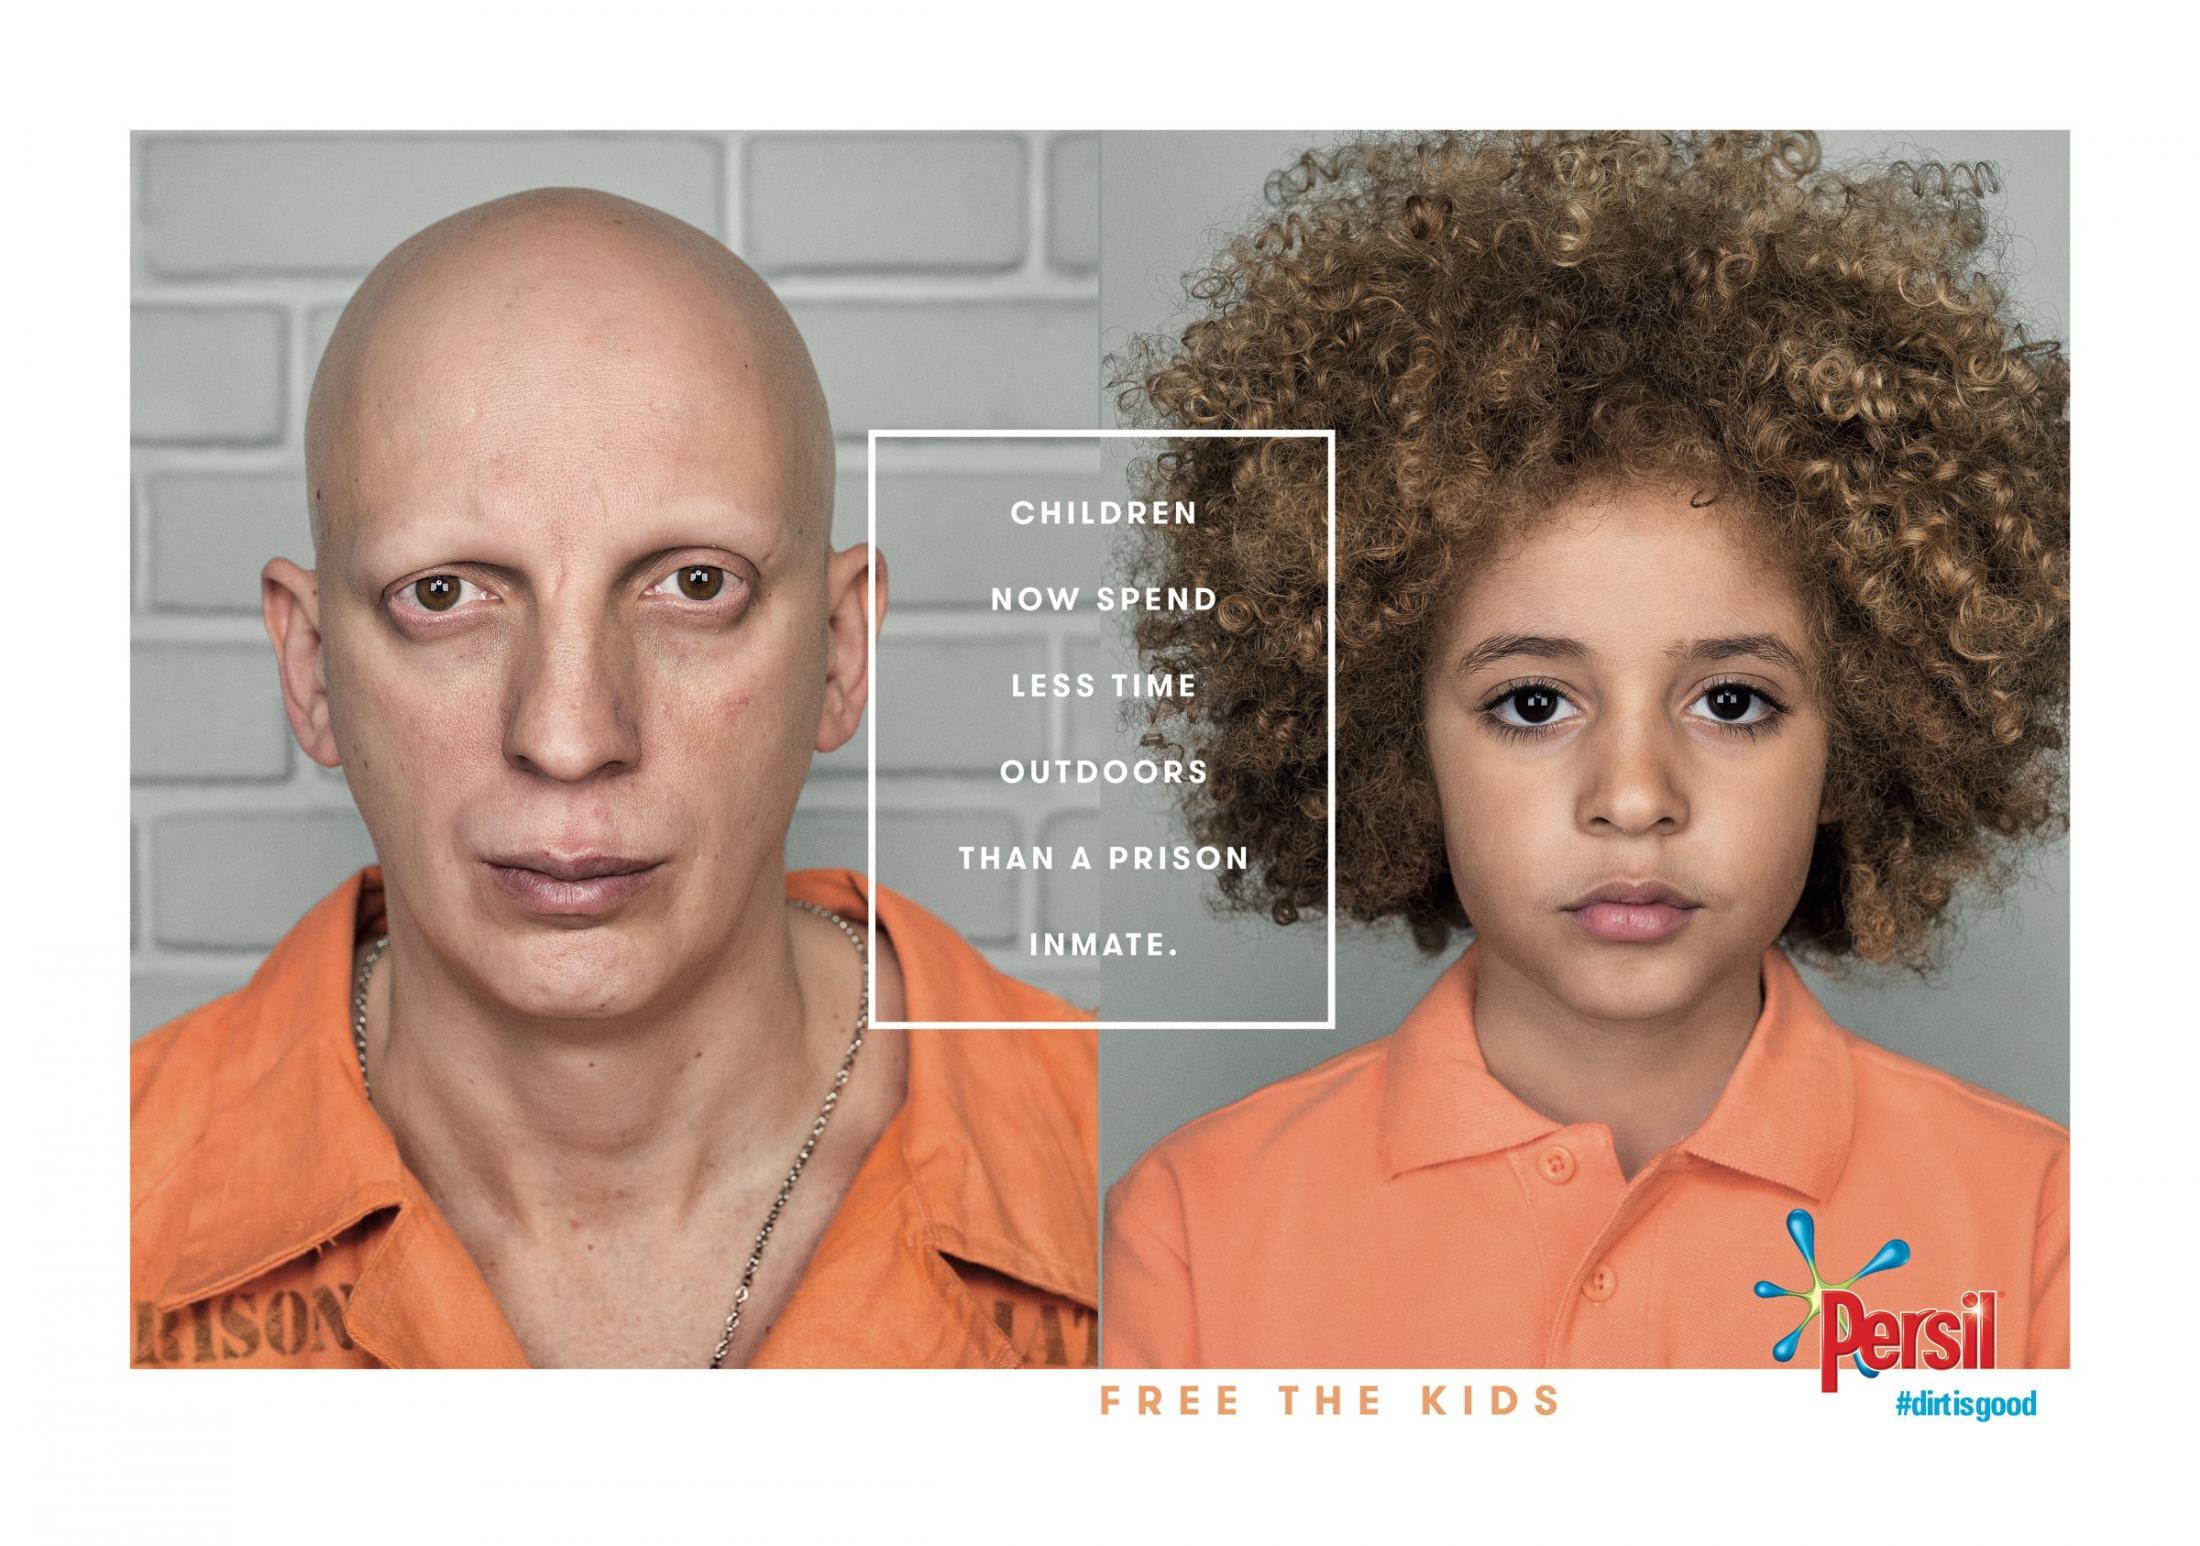 free_the_kids_print_3_aotw.jpg